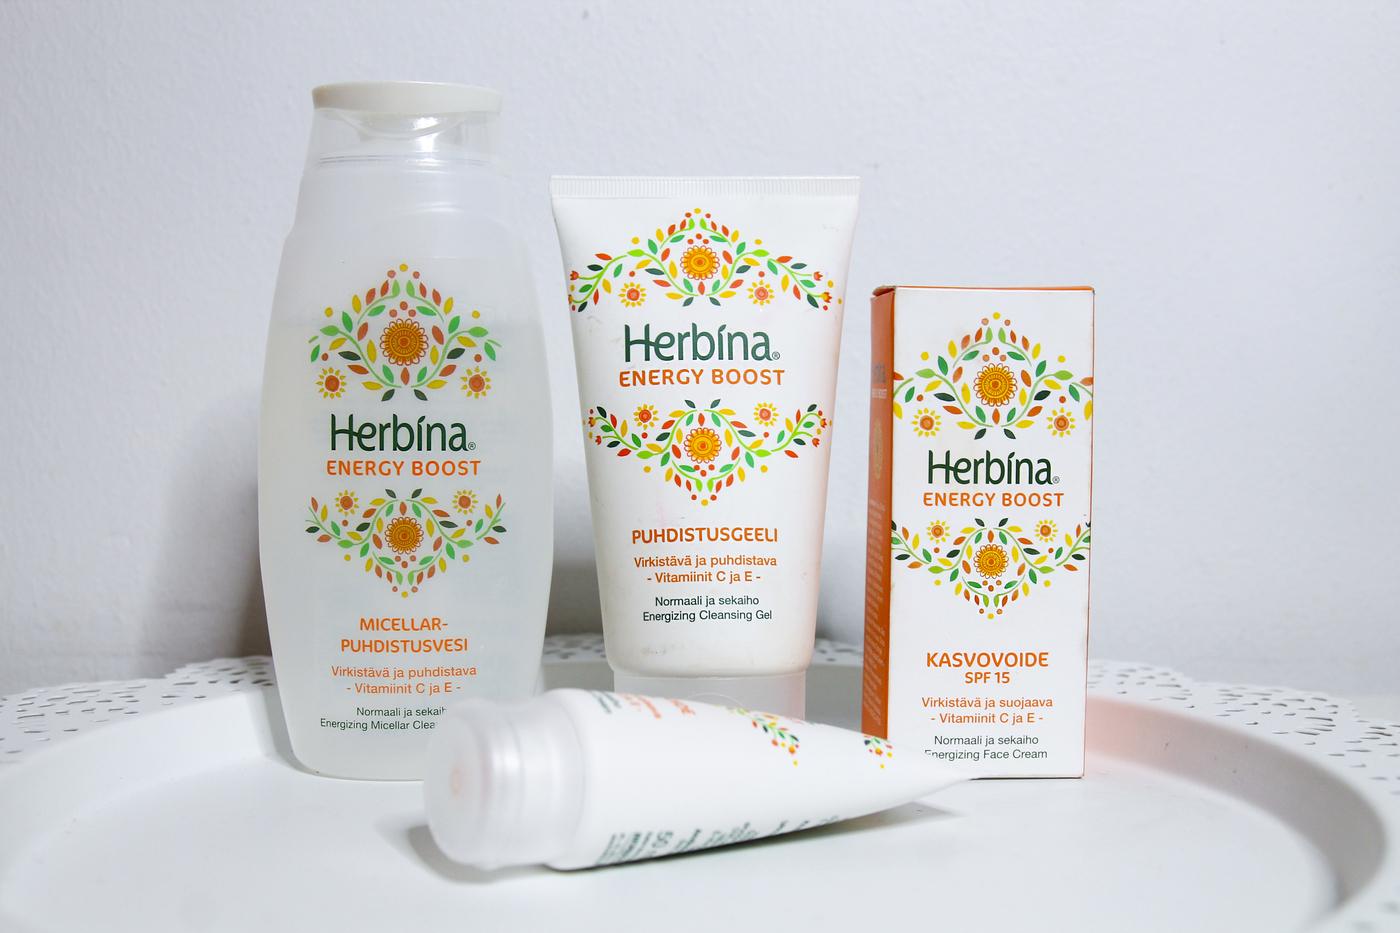 herbina puhdvesi3.jpg